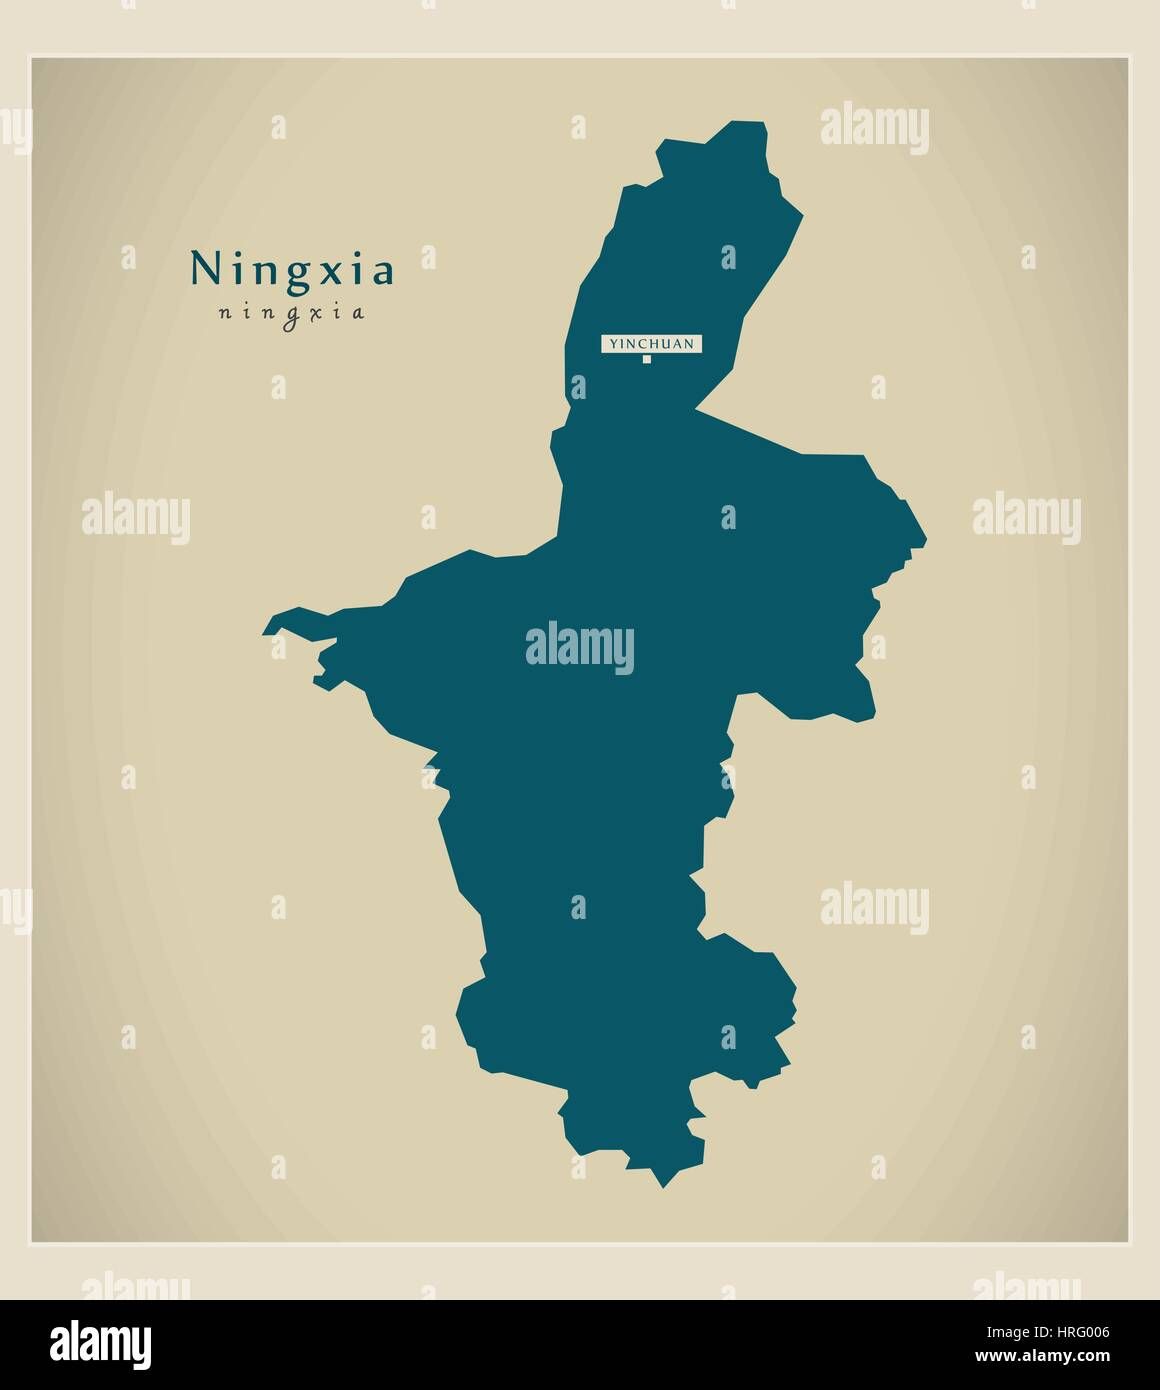 Modern Map - Ningxia - Stock Image